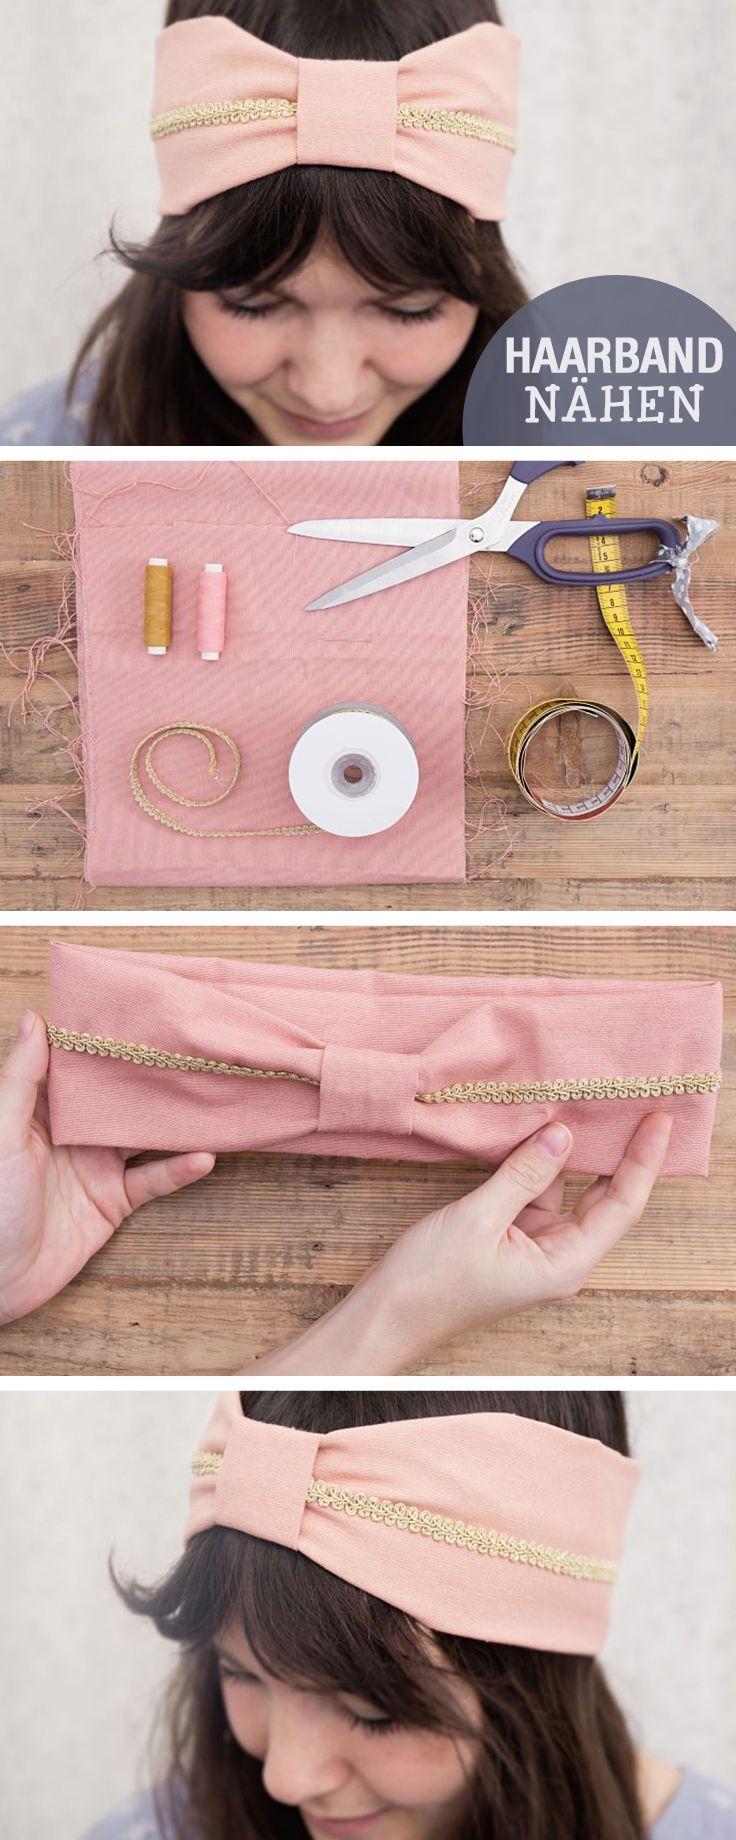 DIY- Anleitung: Stirnband nähen mit Schleife, Haarband selbermachen / diy tutorial: sew a head band, bow via DaWanda.com